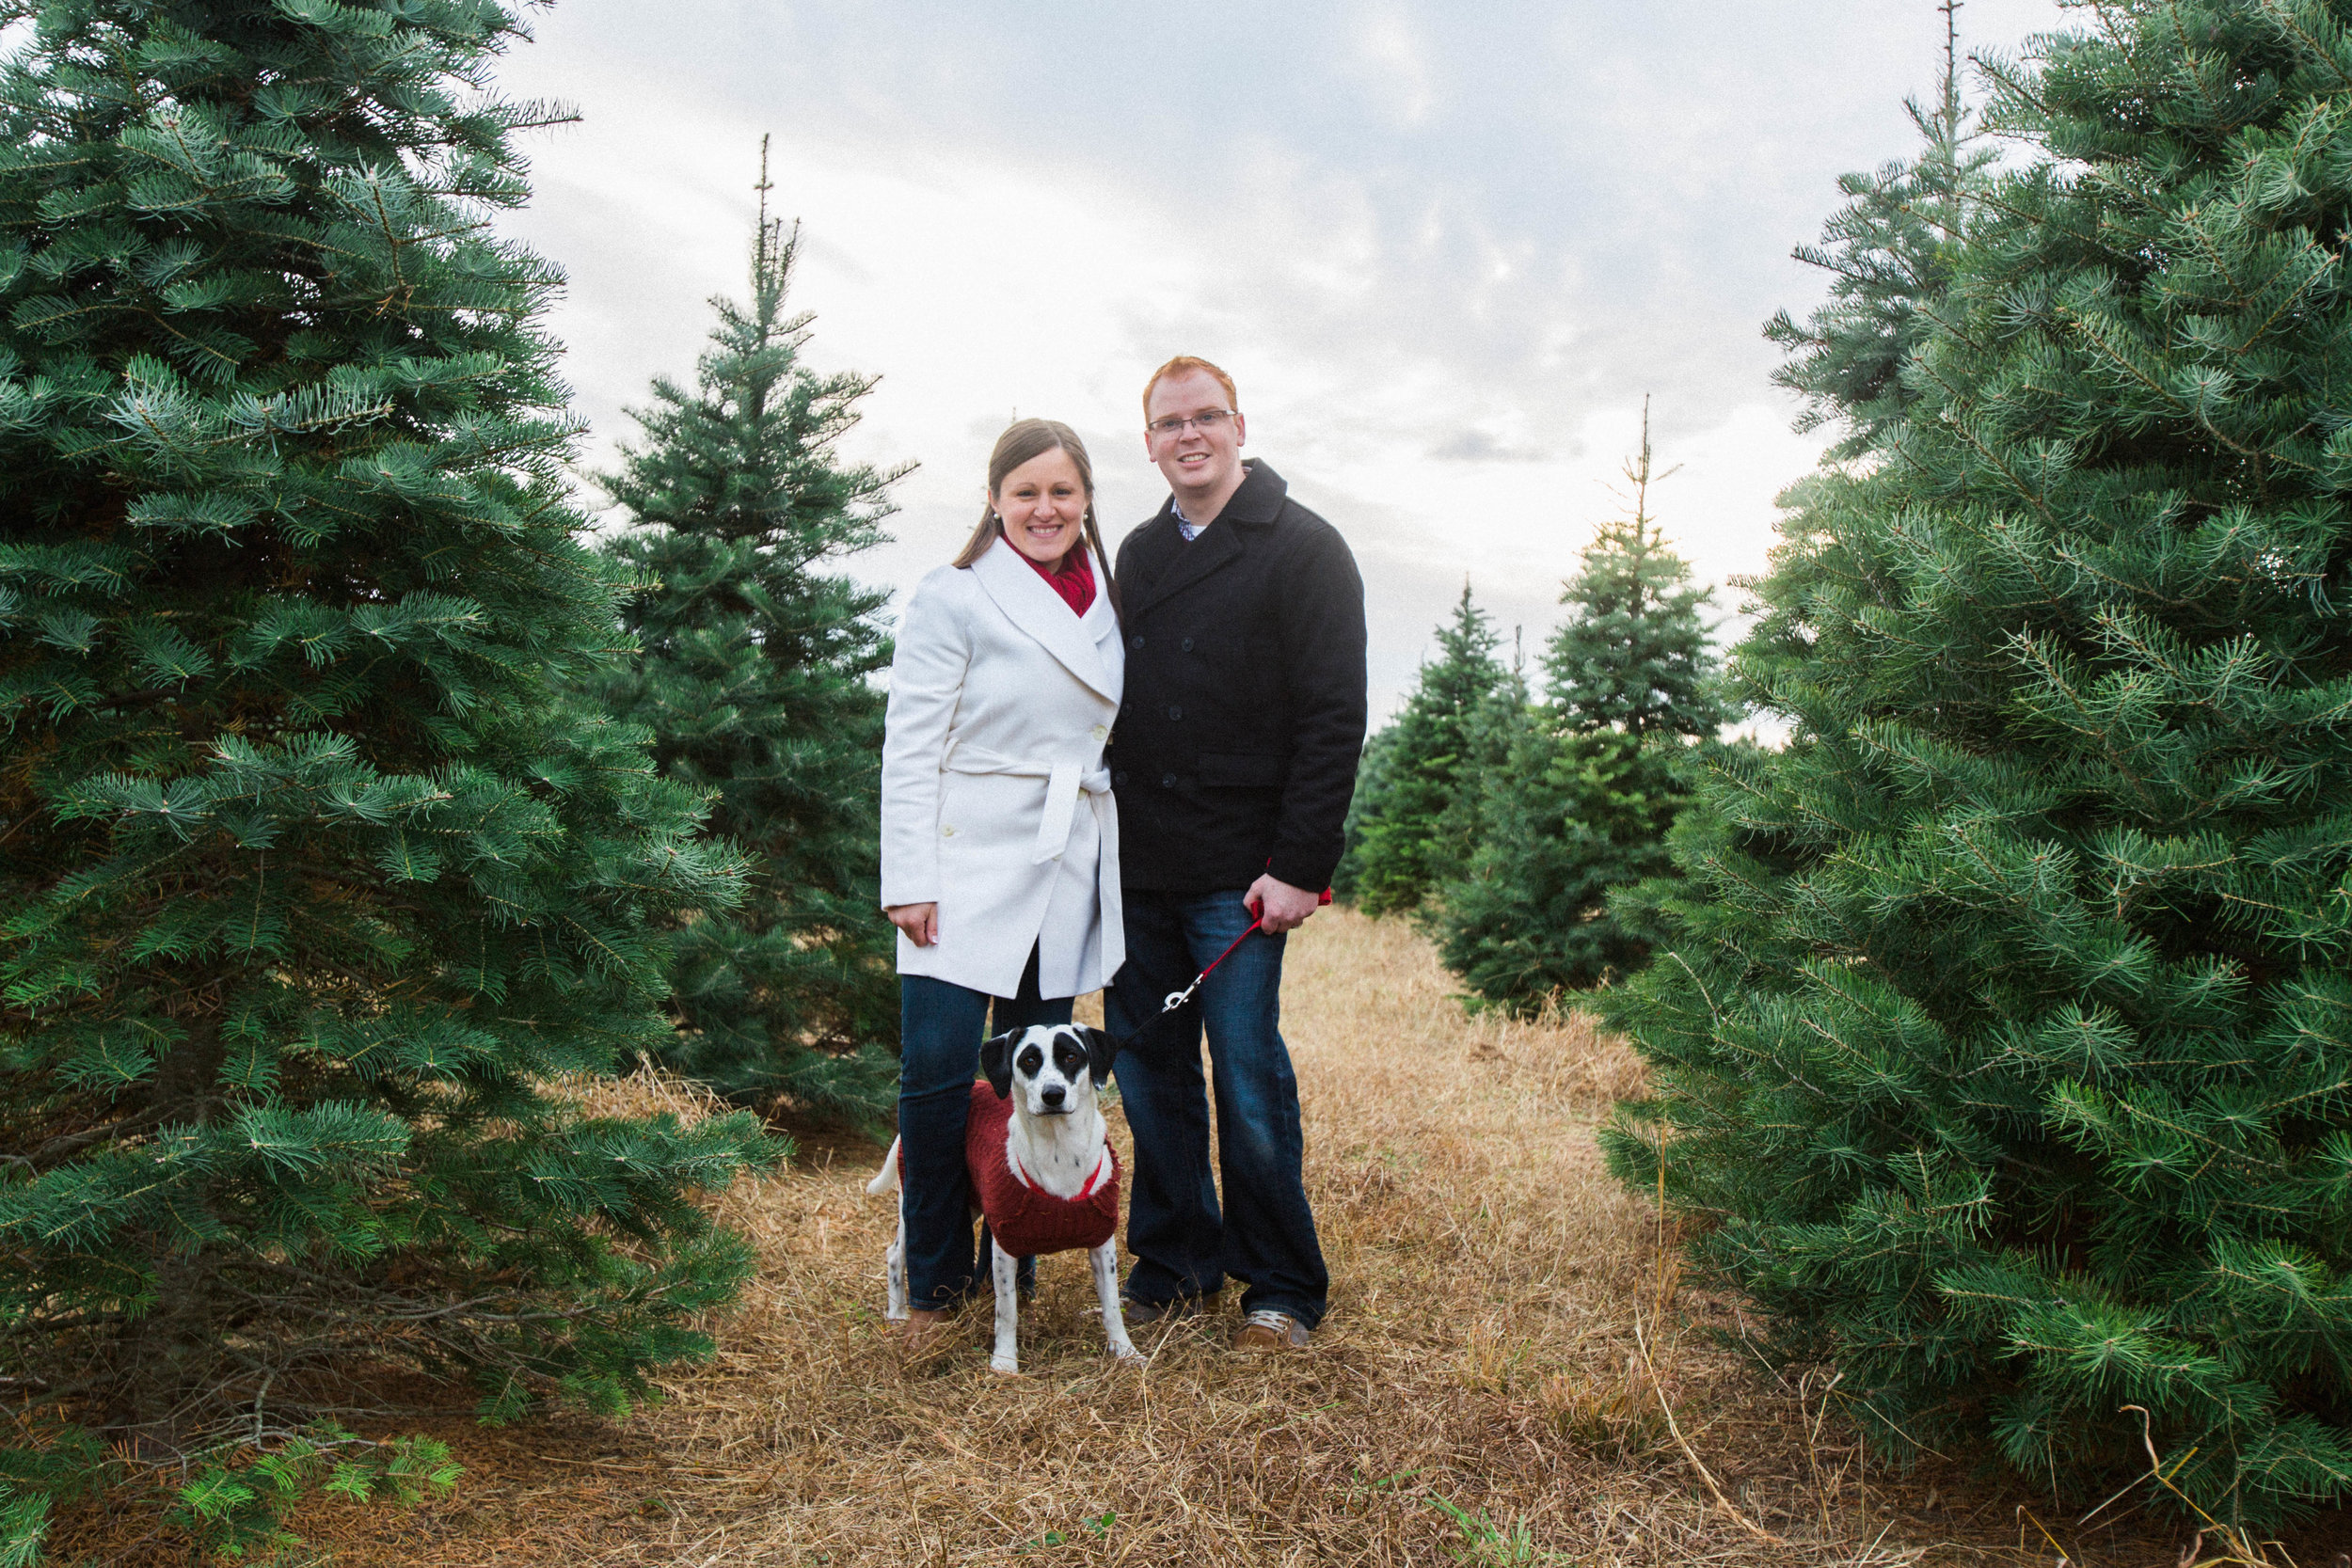 CHRISTMAS_TREE_FARM_ENGAGEMENT_PHOTOS--0003.jpg